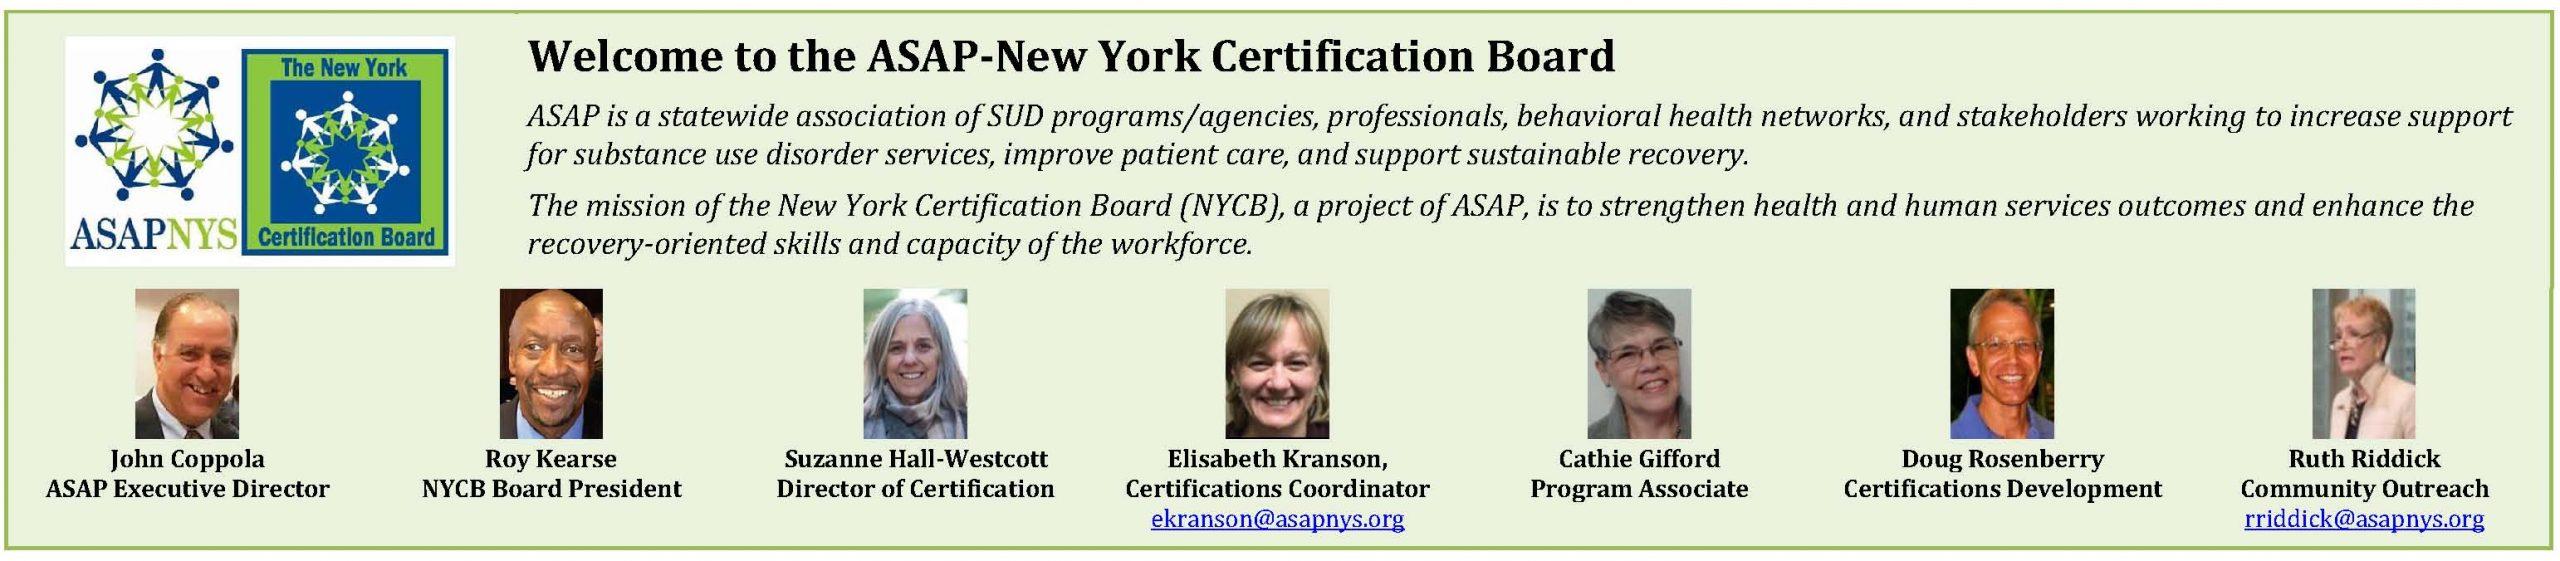 ASAP-NYCB.homepage-banner.6-2-2020